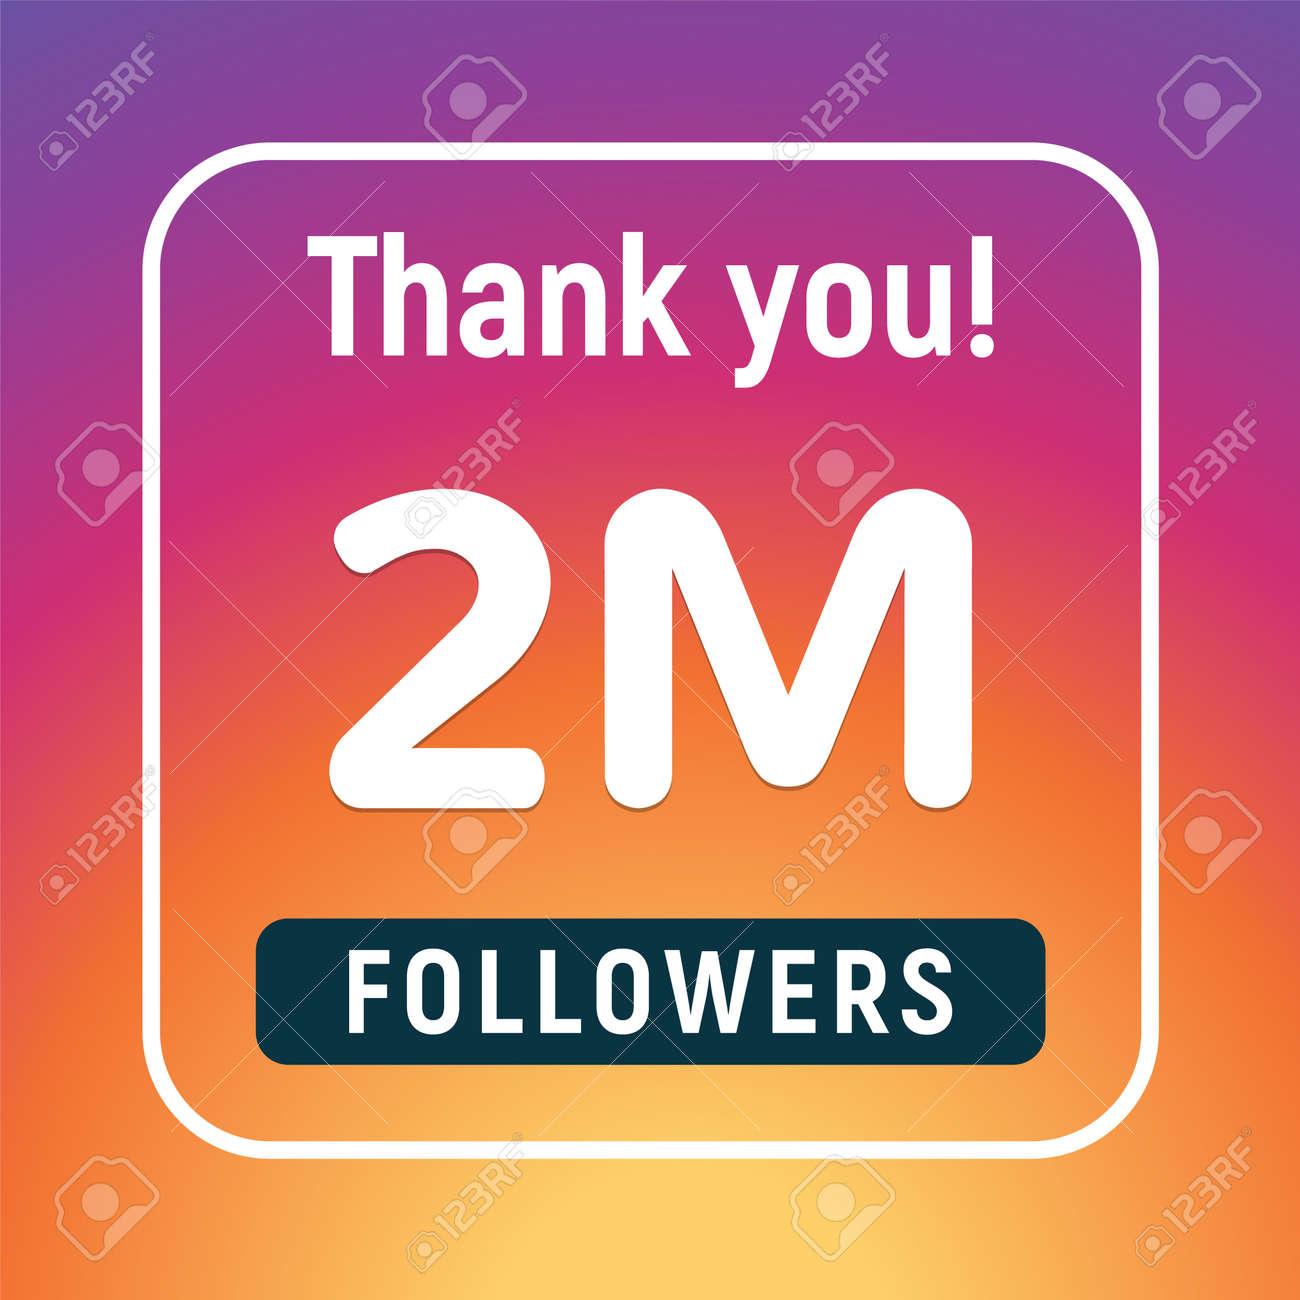 Thank you 2 million followers congratulation subscribe. 2m like follow anniversary - 168952988